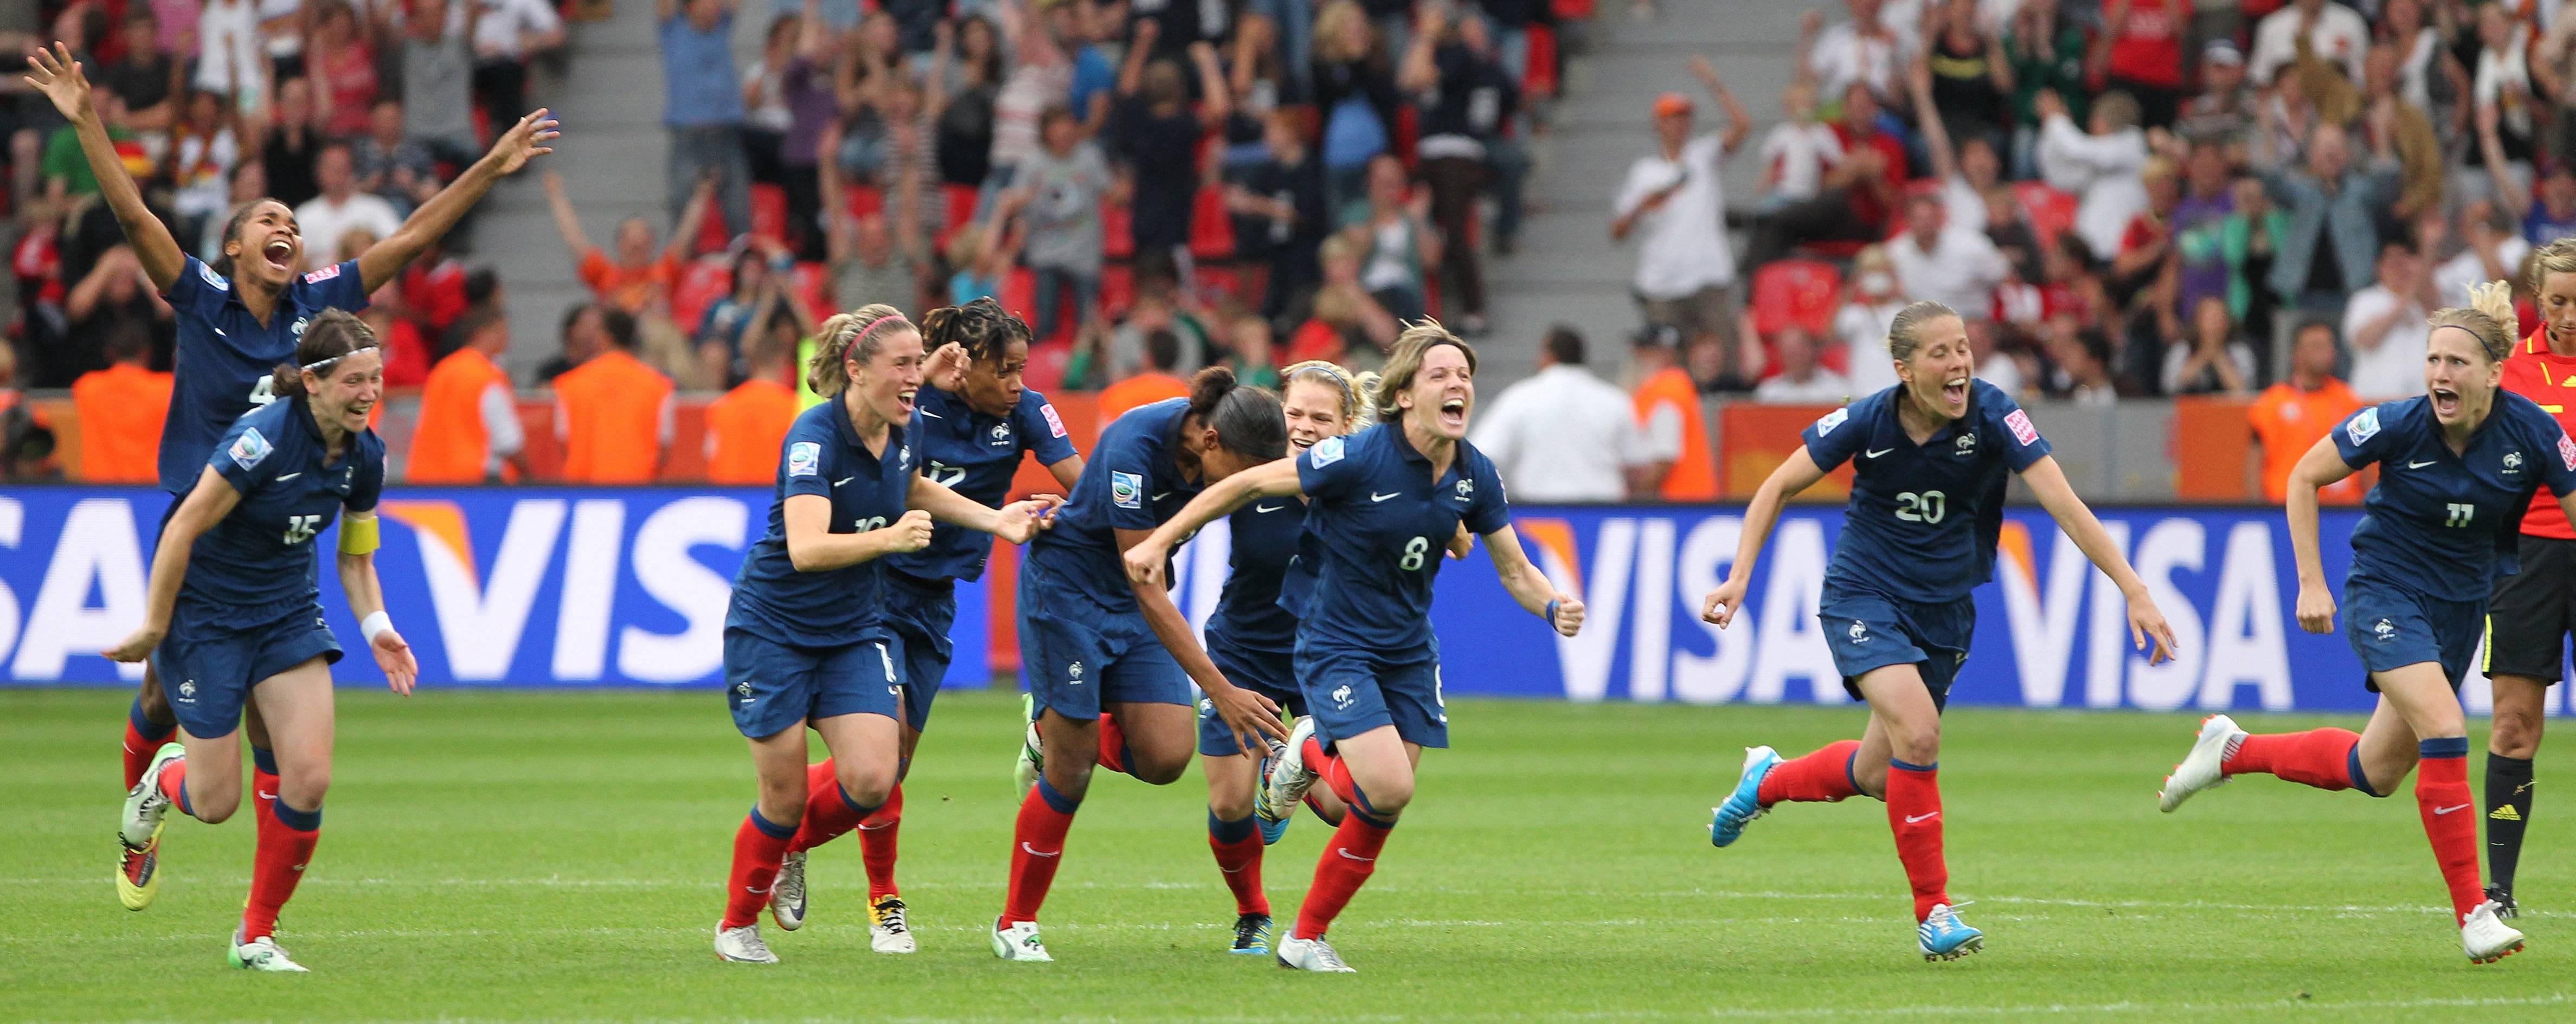 EDF Féminine France-Angleterre Coupe du monde 2011